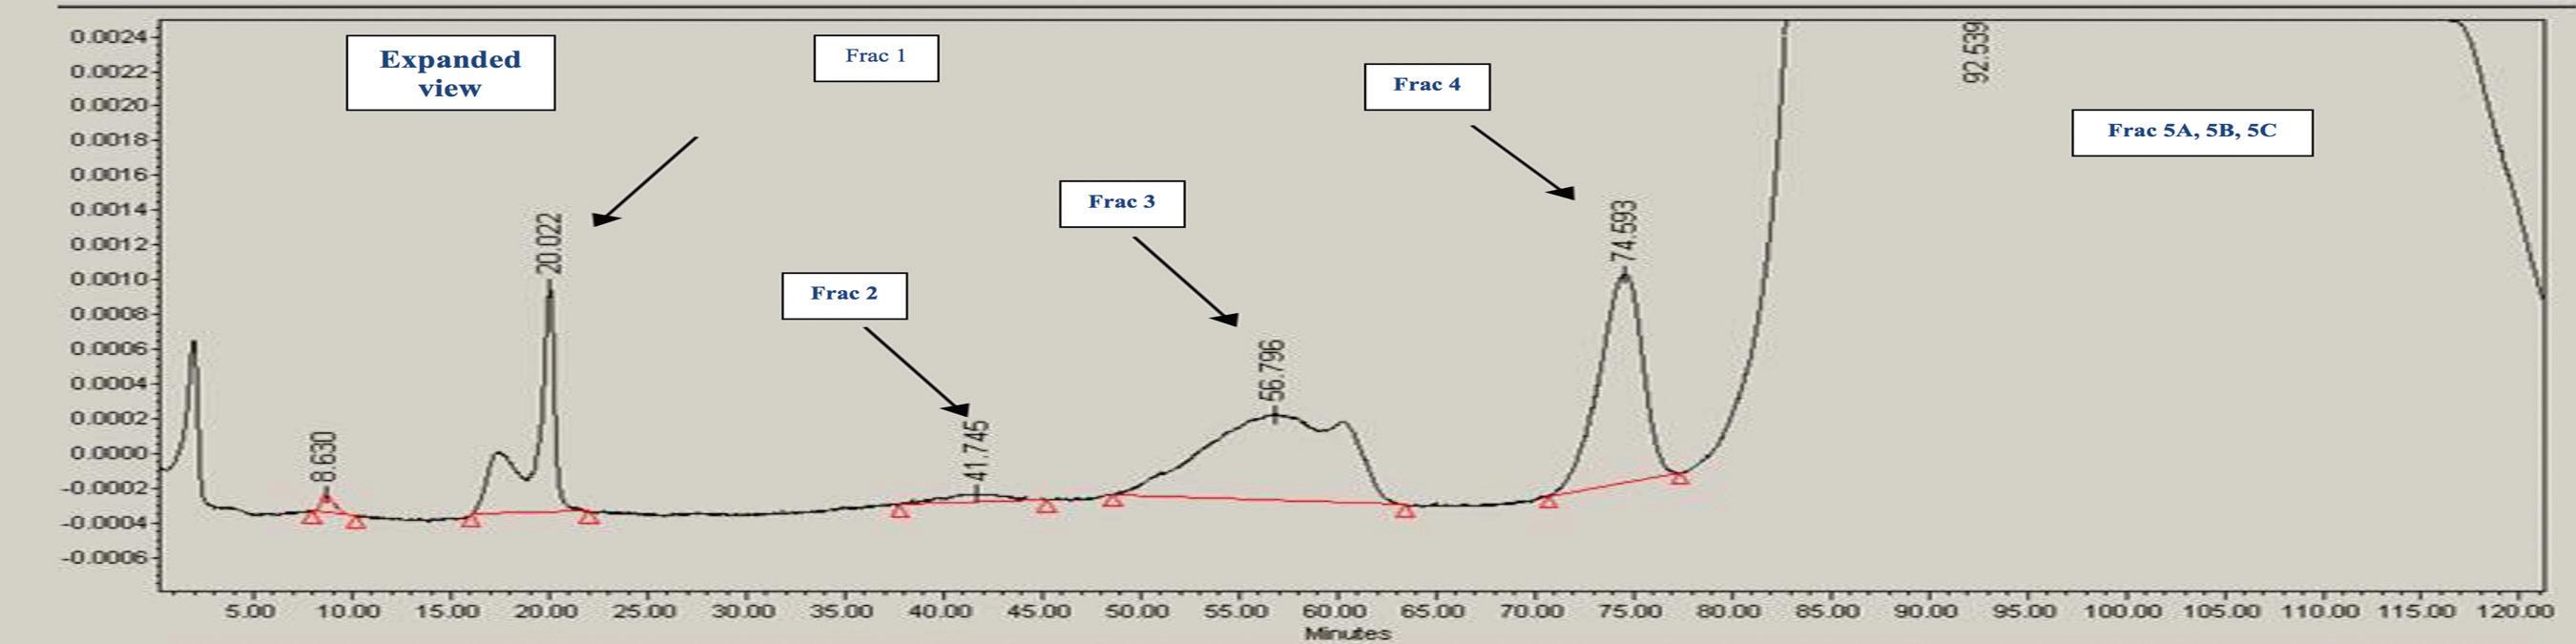 Figure 2. Representative IEX Chromatogram of Sample (Expanded View)